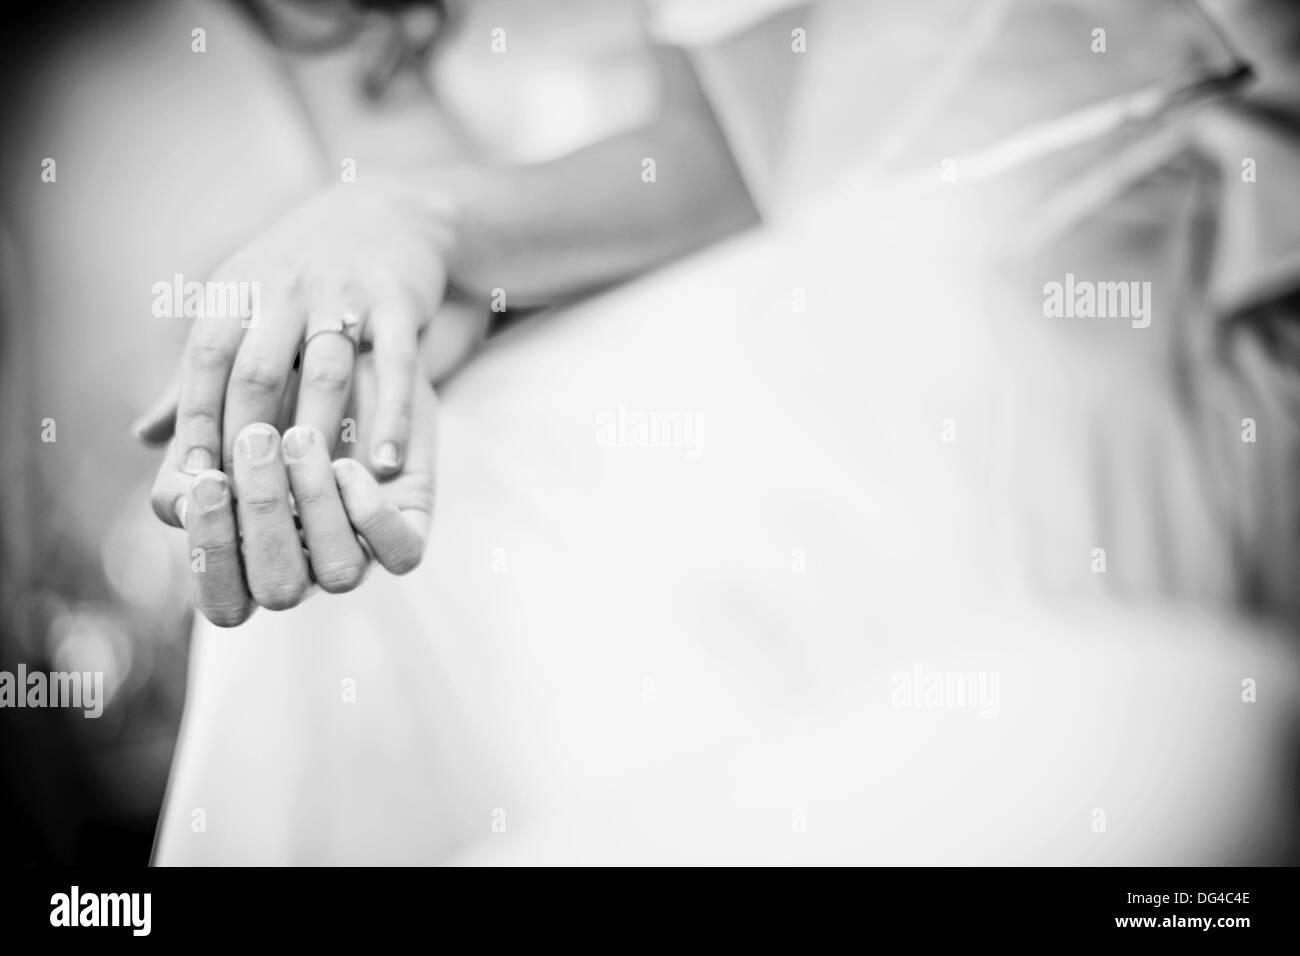 wedding ring, hands together - Stock Image